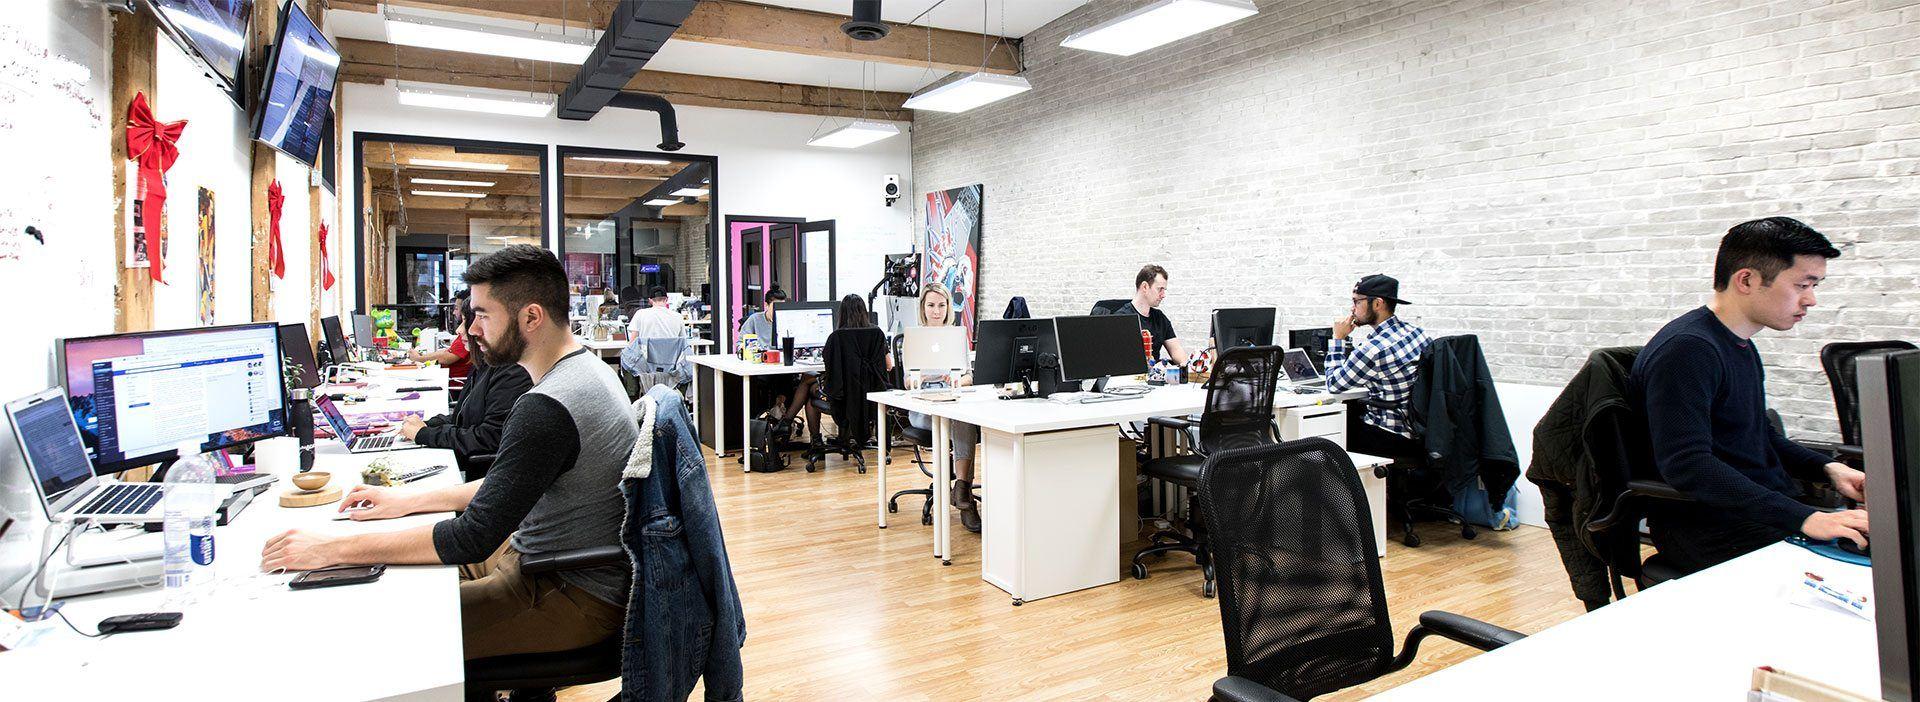 Dailyhive staff hard at work